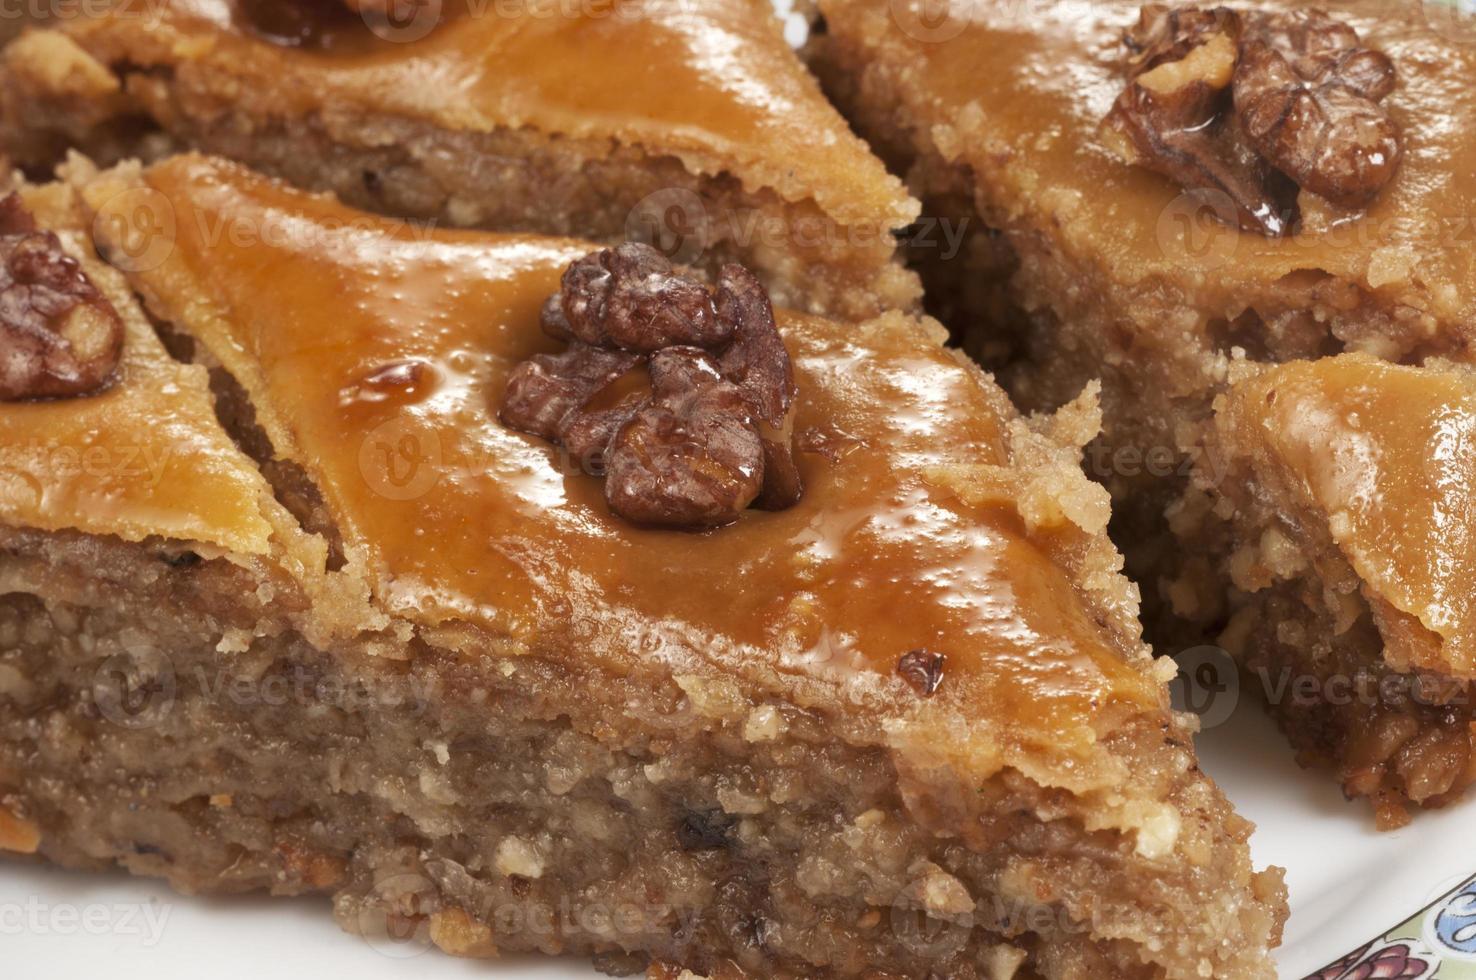 Baklava with walnut photo